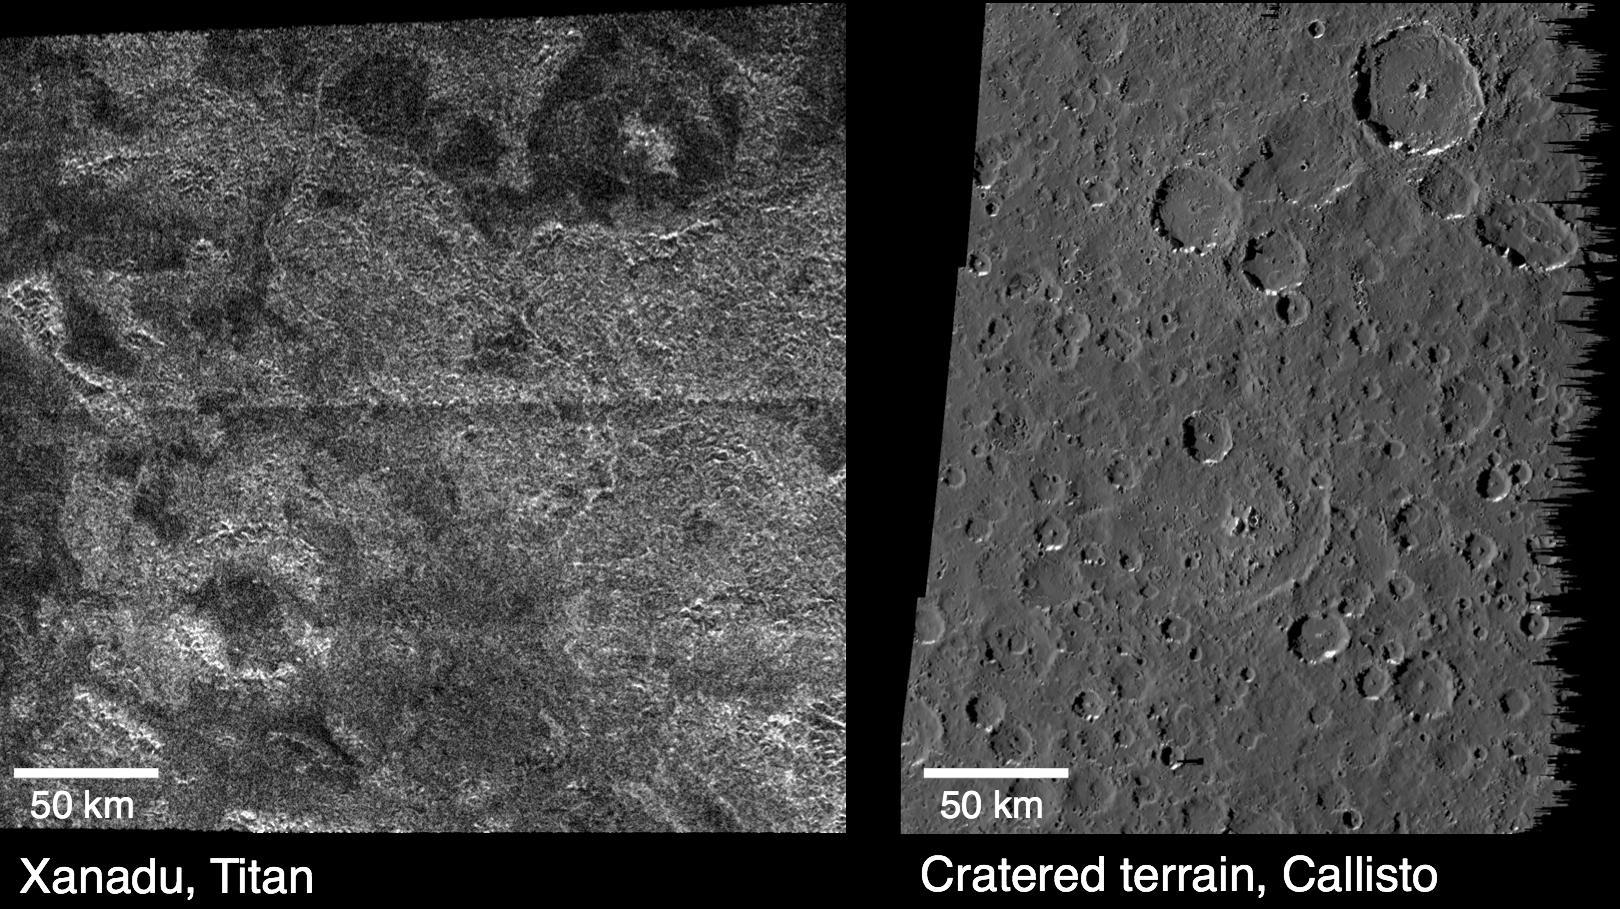 Callisto Map PIA13896 Titan and Callisto